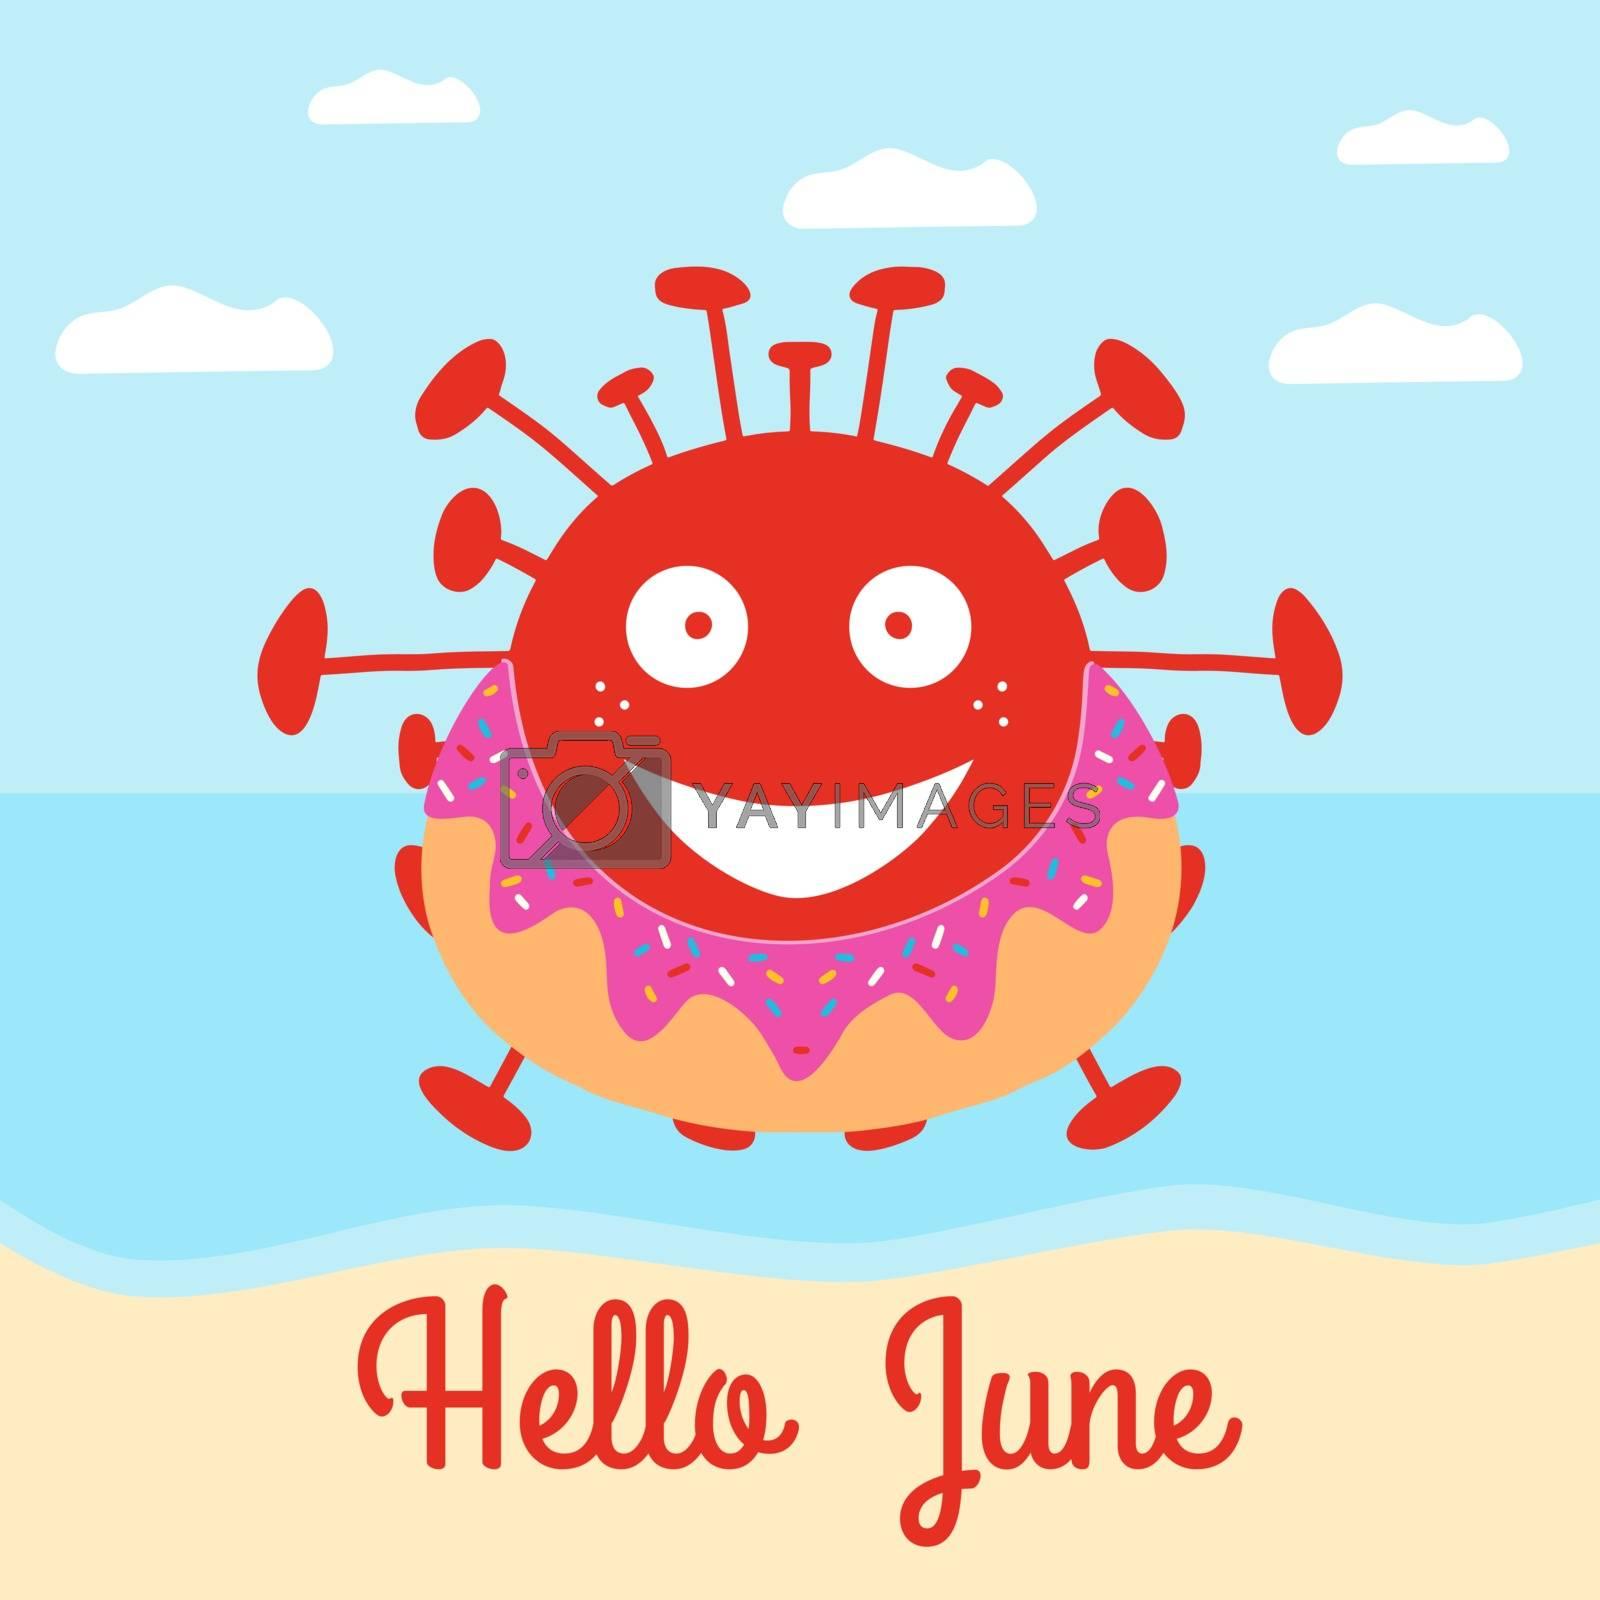 Hello June. Red cartoon coronavirus bacteria in donut swimming circle on the beach. Vector stock illustration.